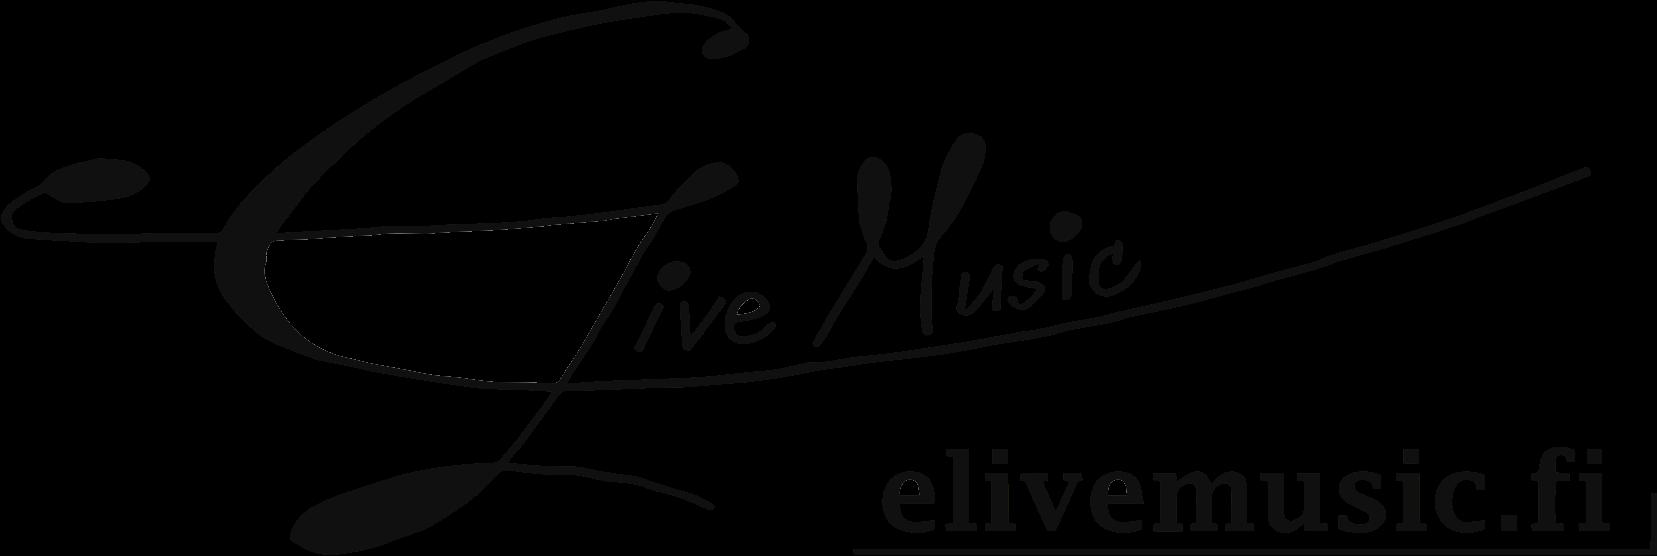 ELive Stream